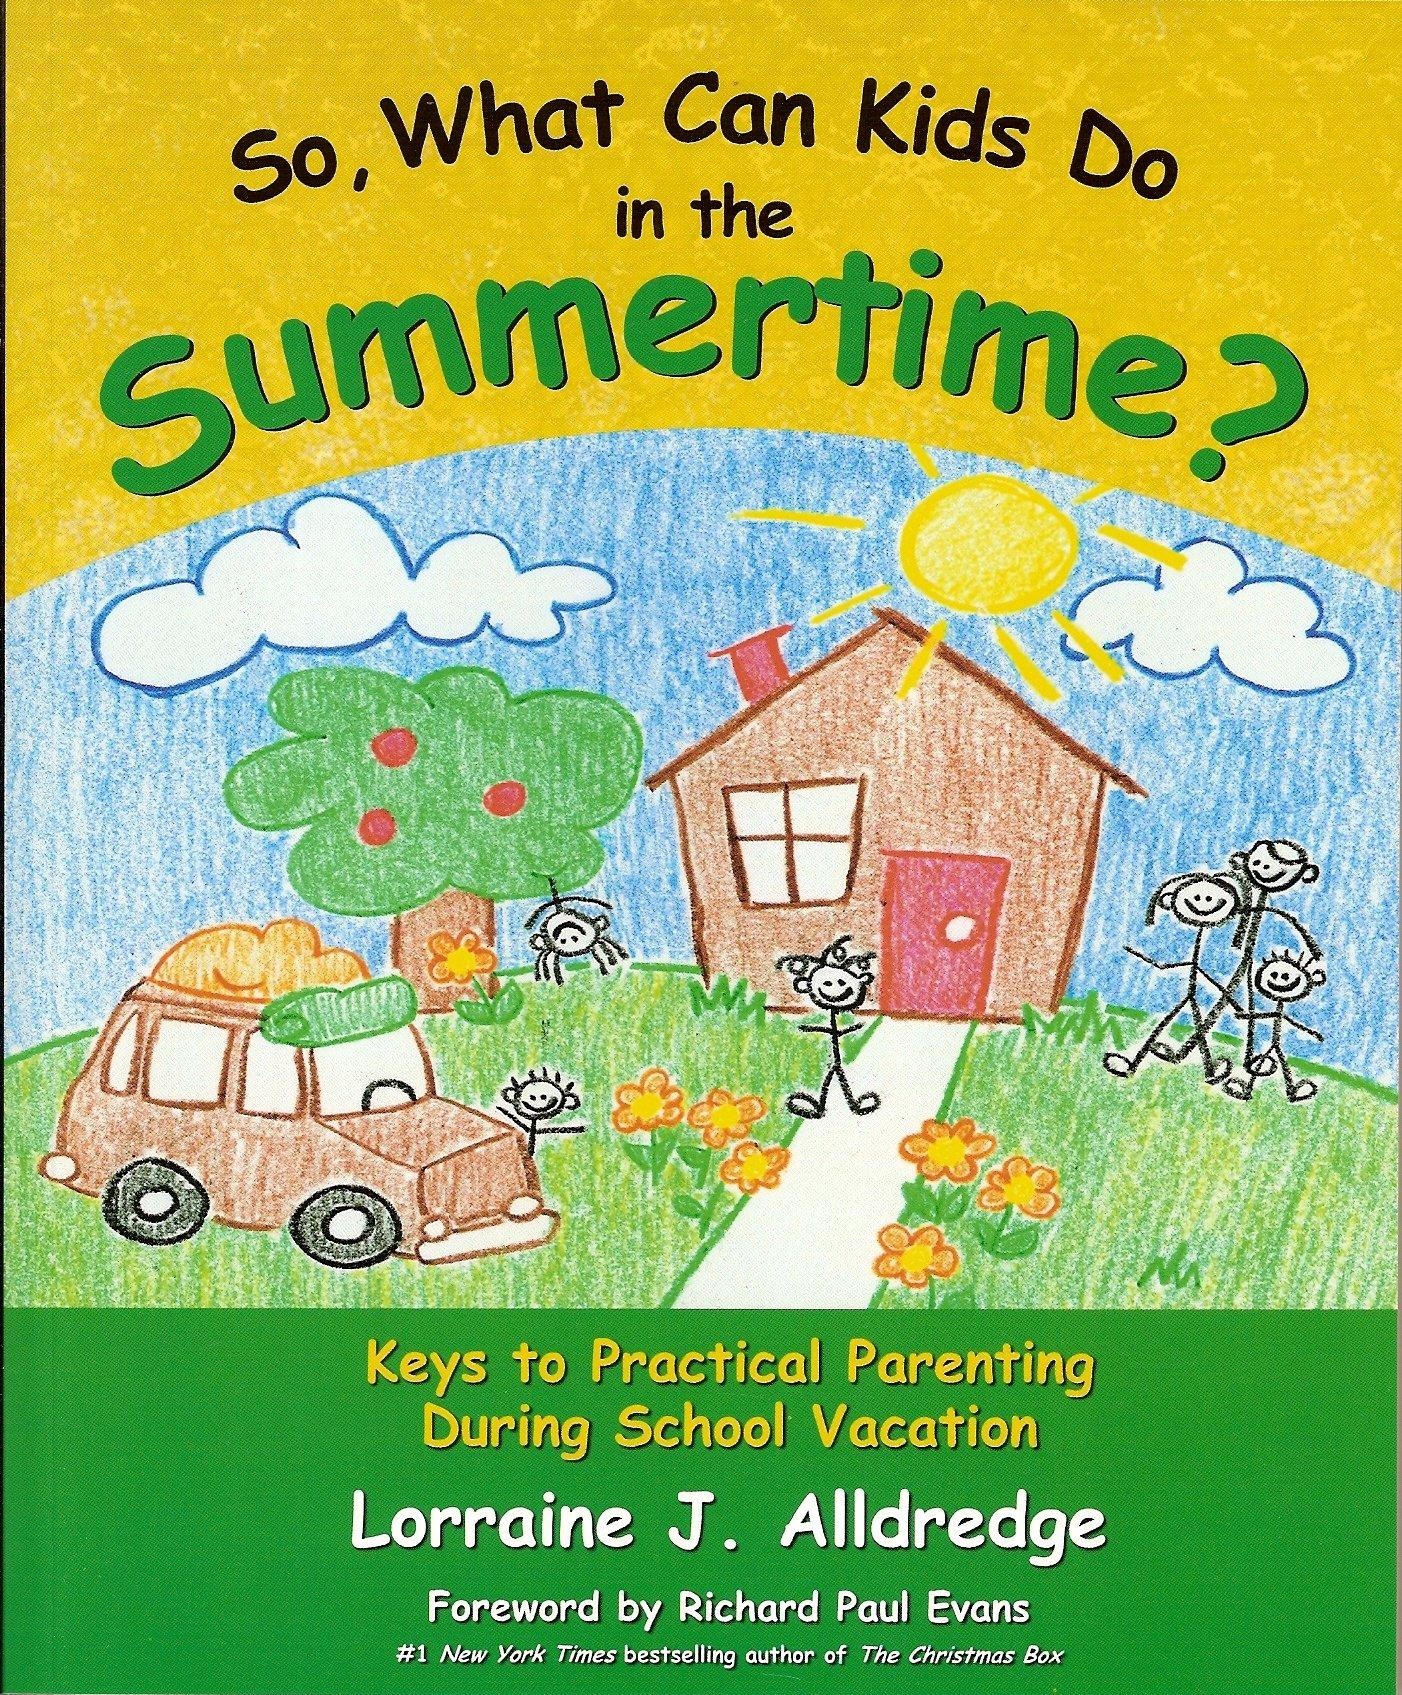 So, What Do Kids Do in the Summertime